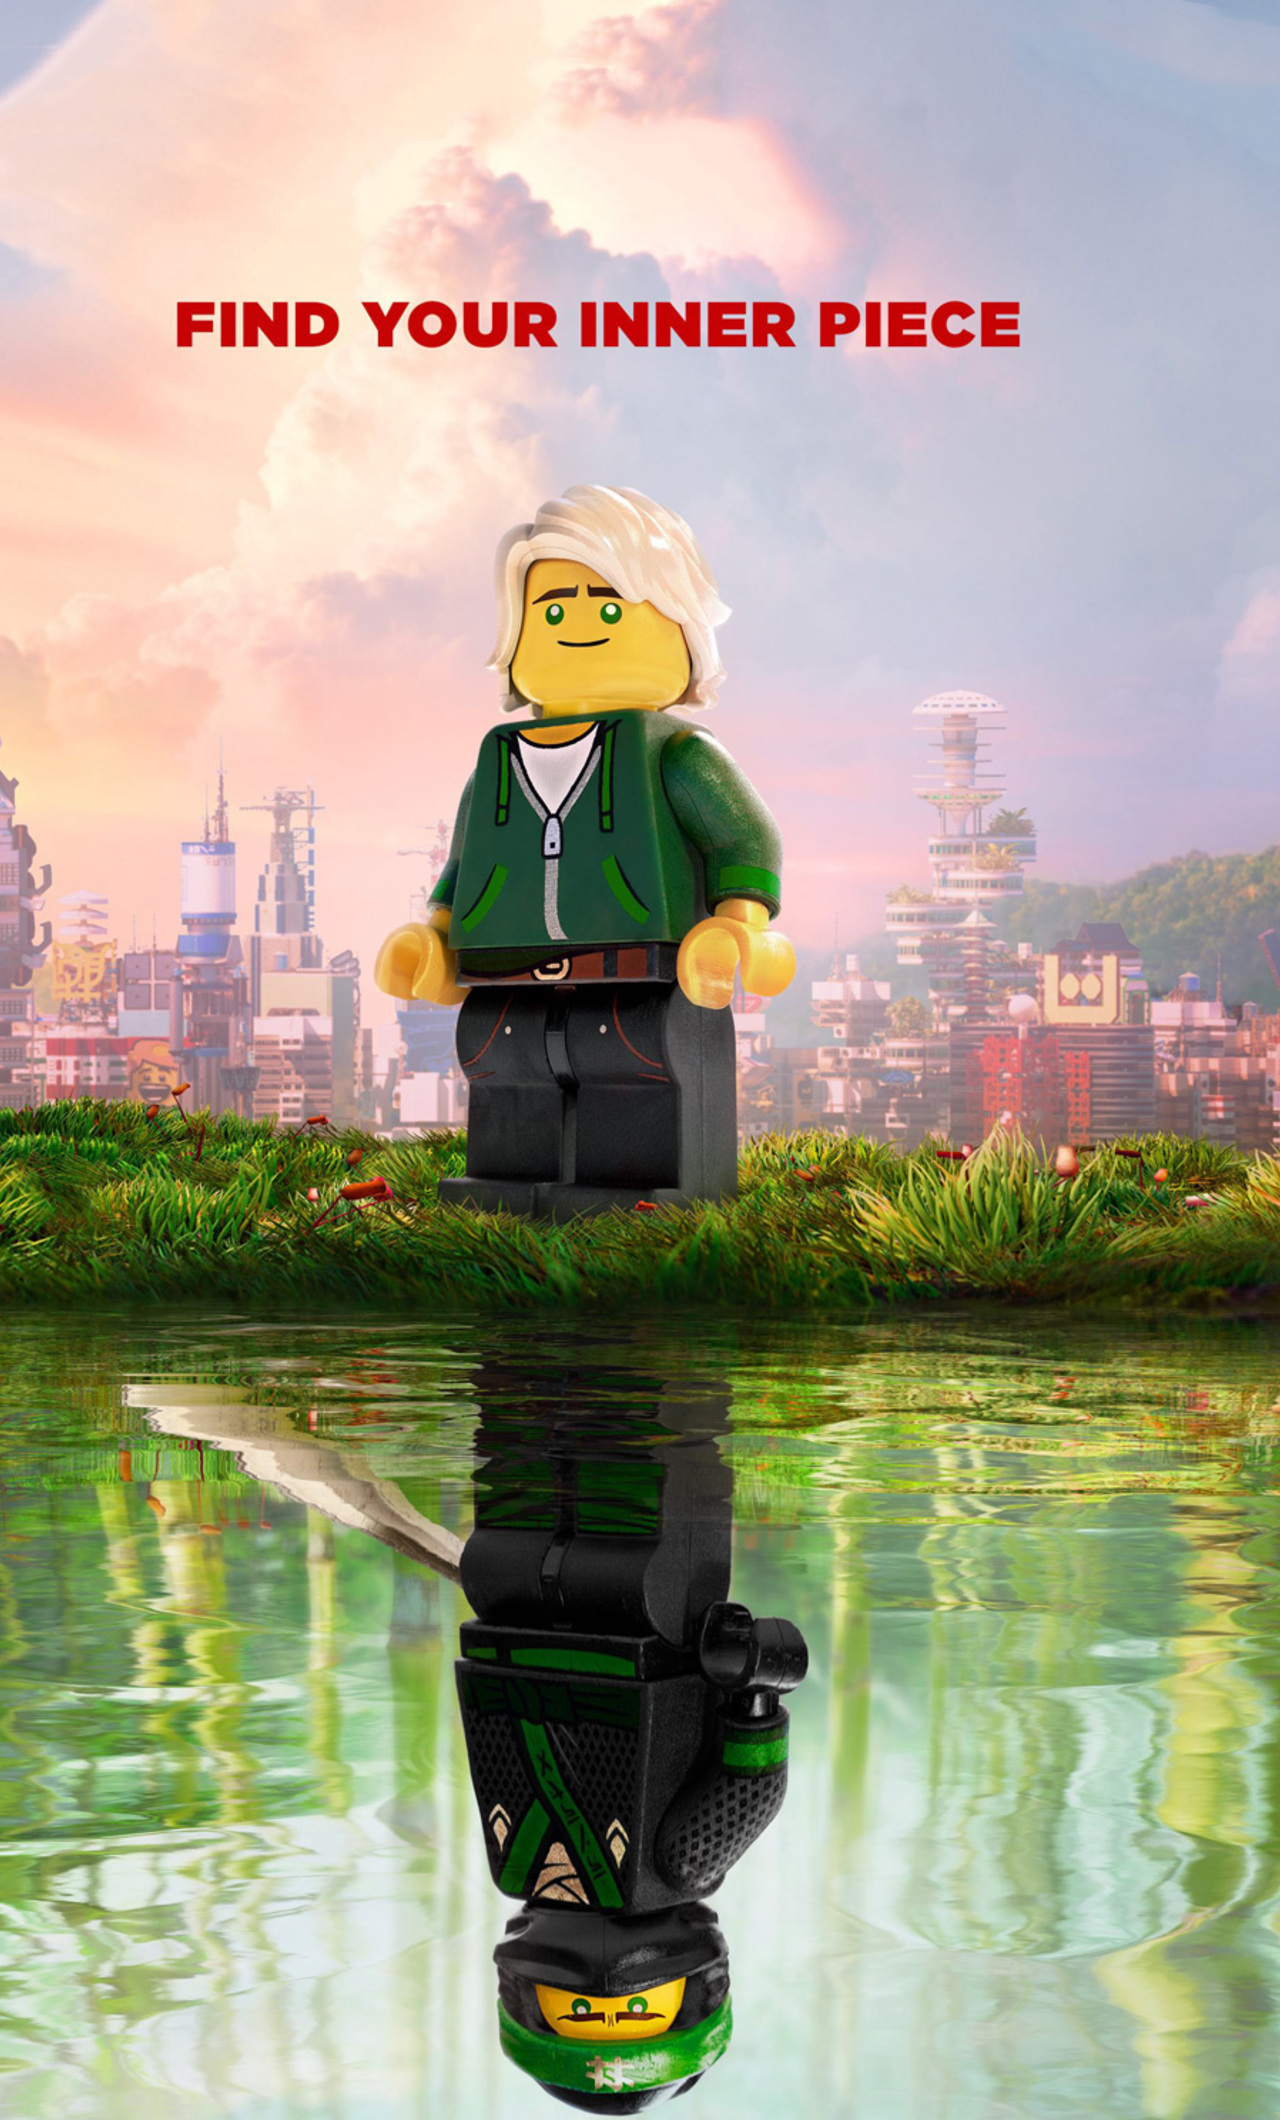 Lloyd Garmadon The Lego Ninjago Movie 7d